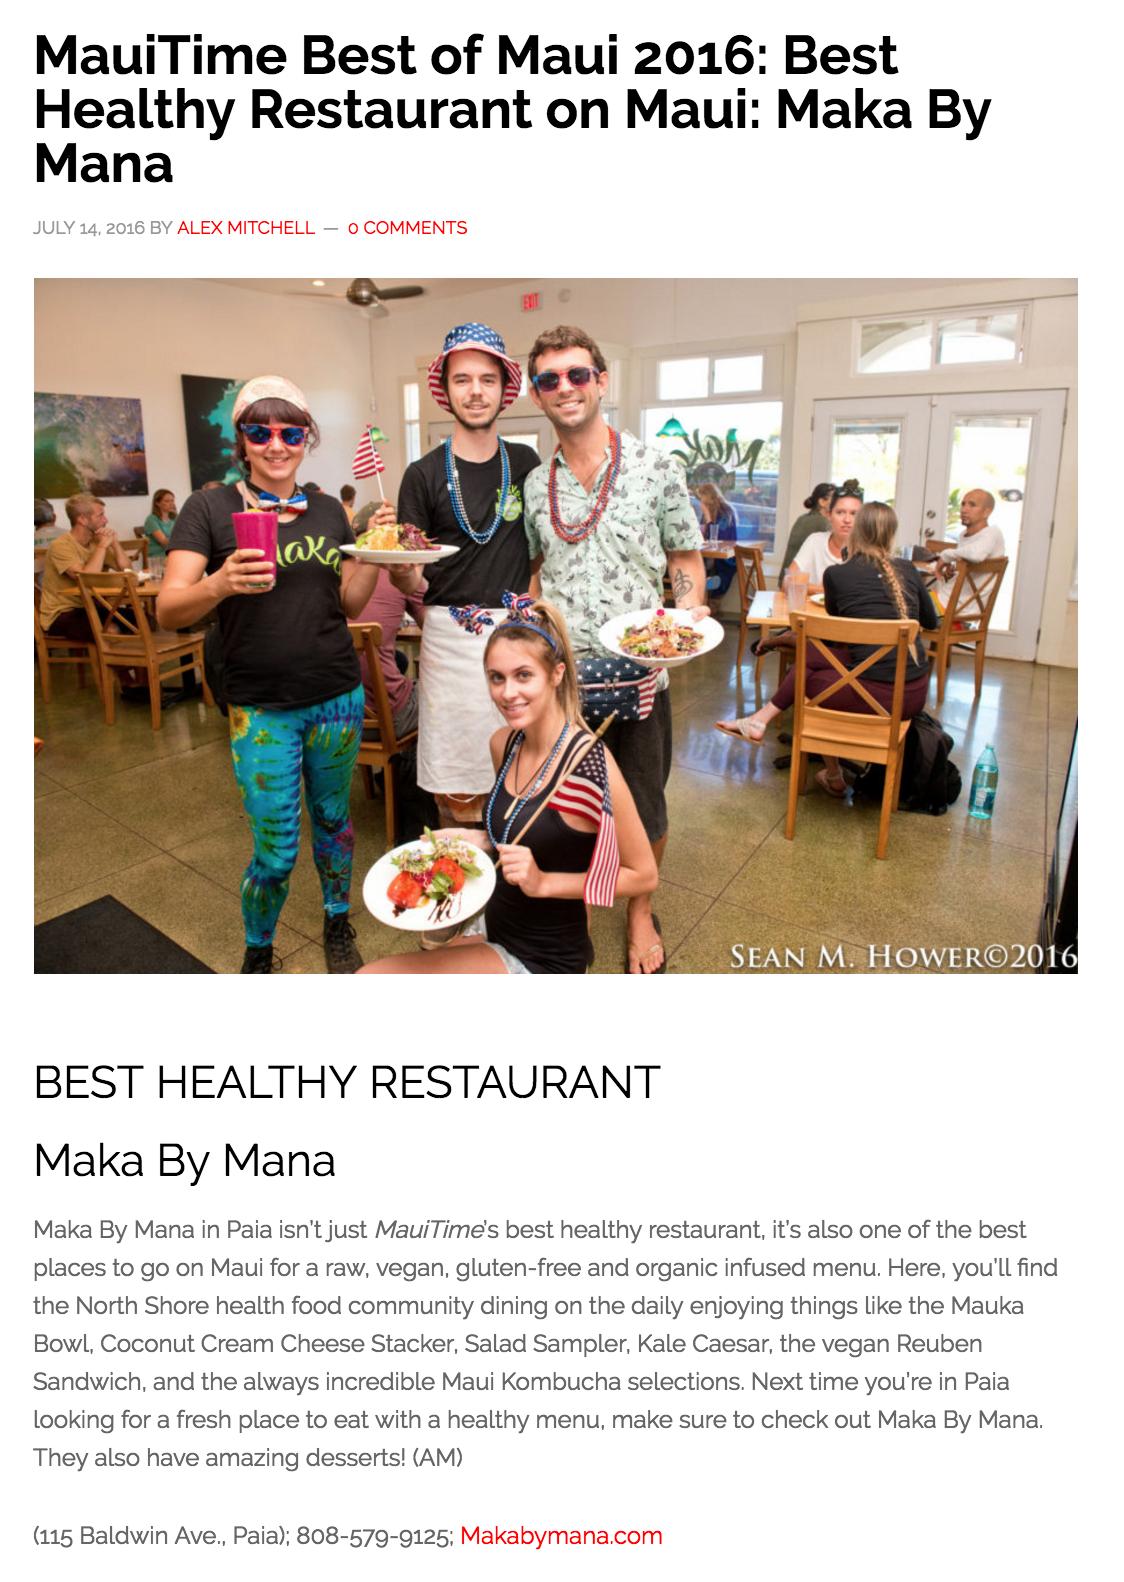 Maka-By-Mana-Best-Healthy-Restaurant-Maui-MauiTime-2016